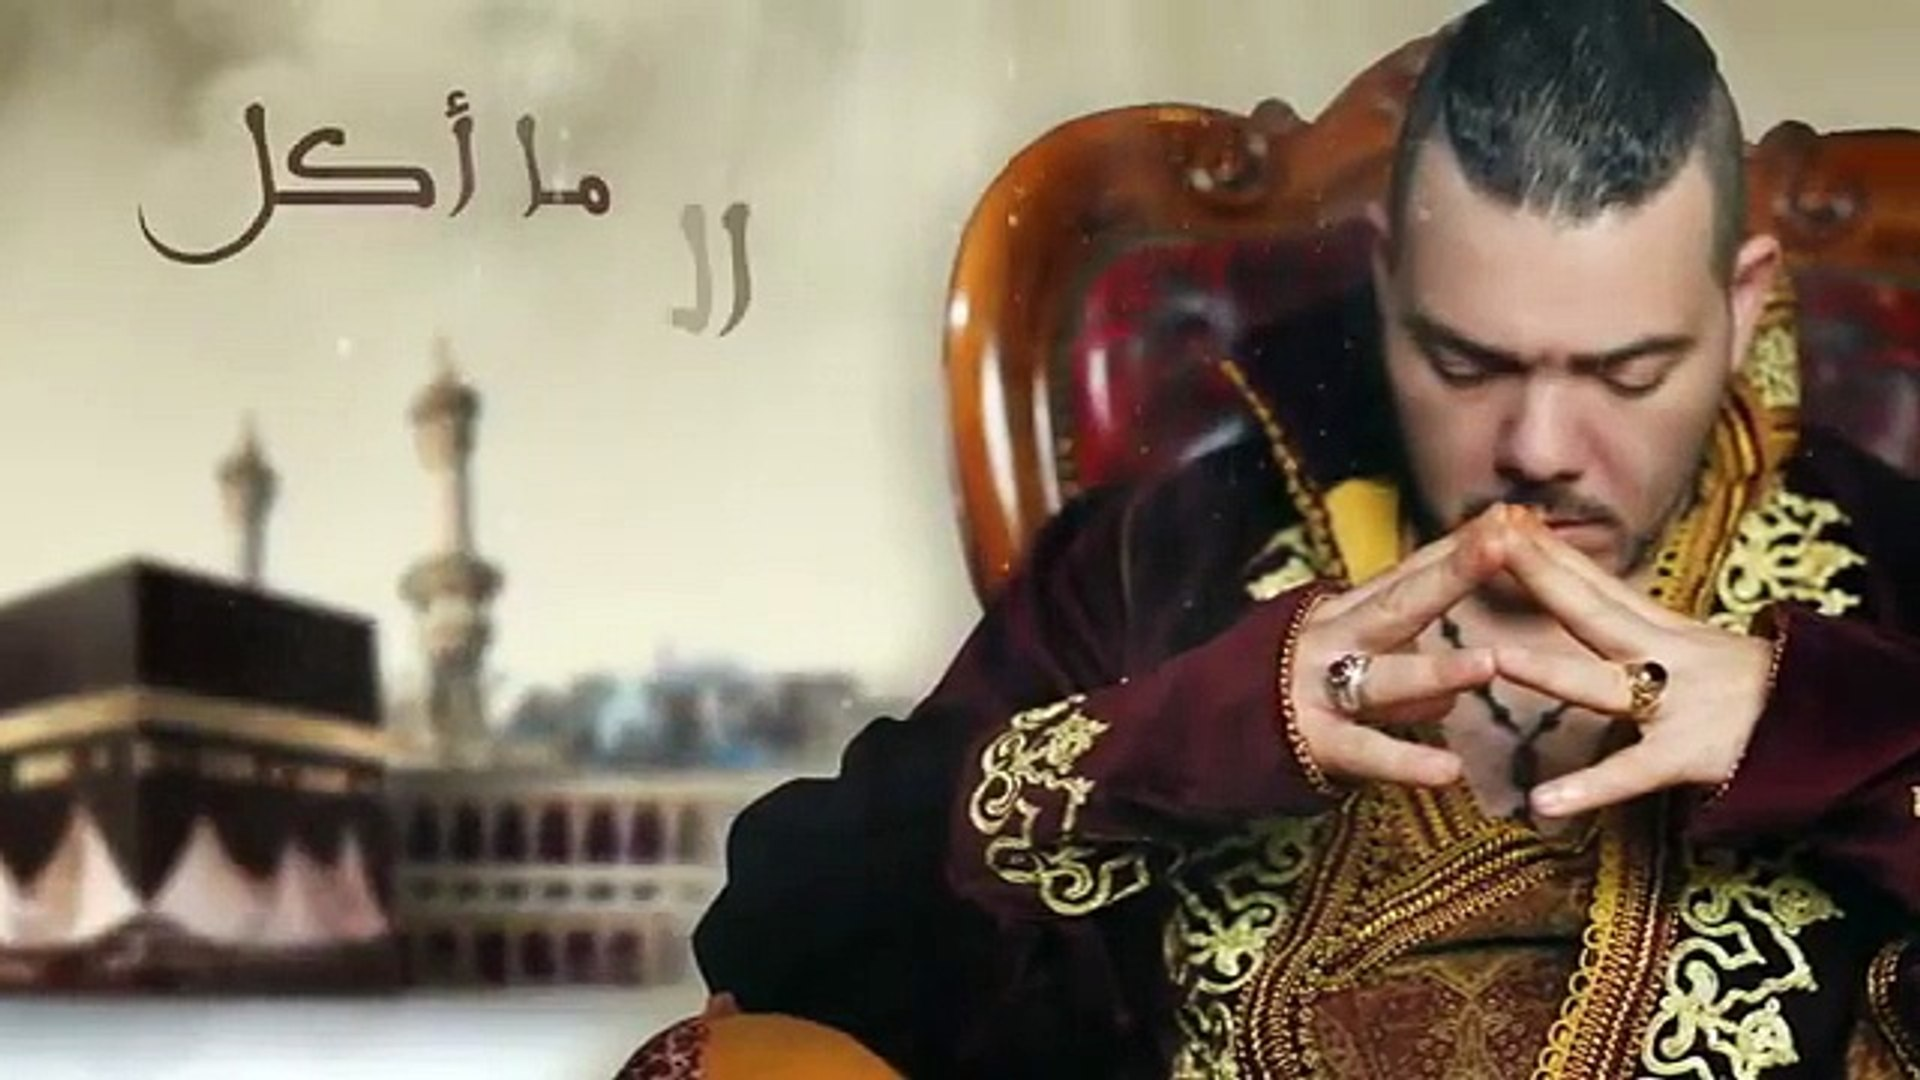 Adil El Miloudi 2016 - عادل الميلودي - عليك بتقوى الله